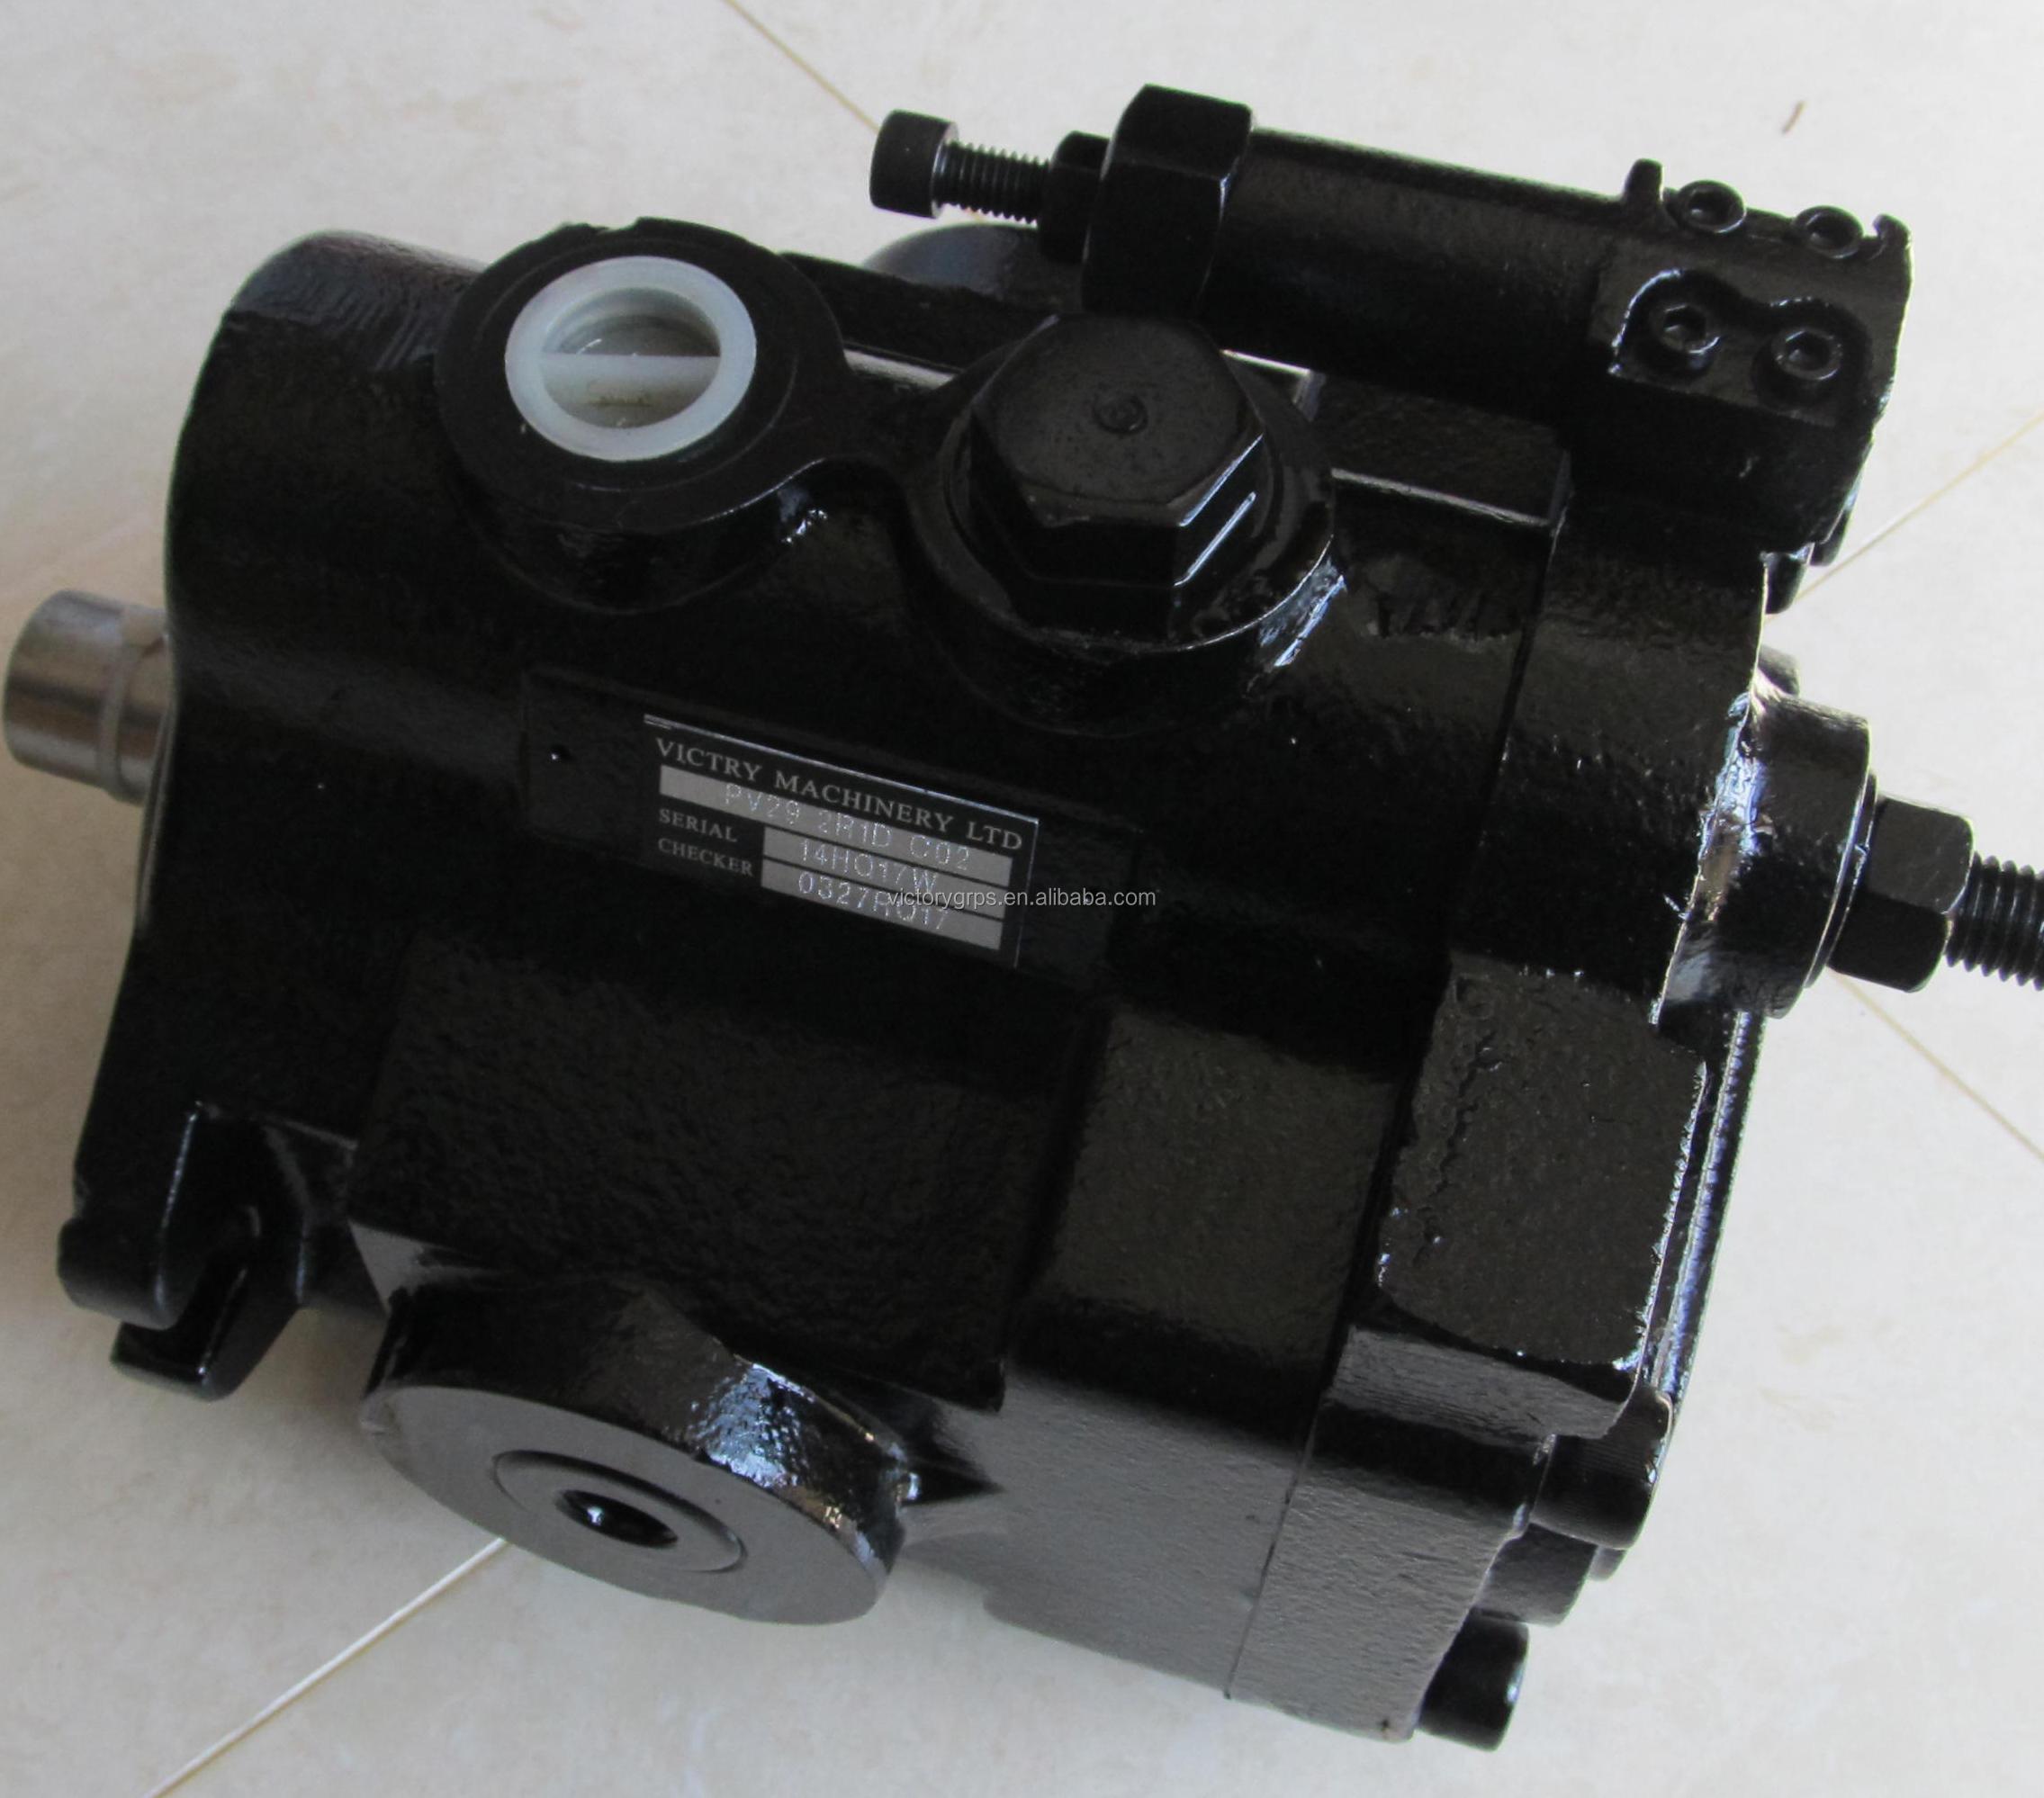 PVT6 PVT10 PVT15 PVT20 PVT29 PVT38 PVT47 PVT64 PV6 PV10 PV15 PV20 PV29 PVT PV Denison Piston pump